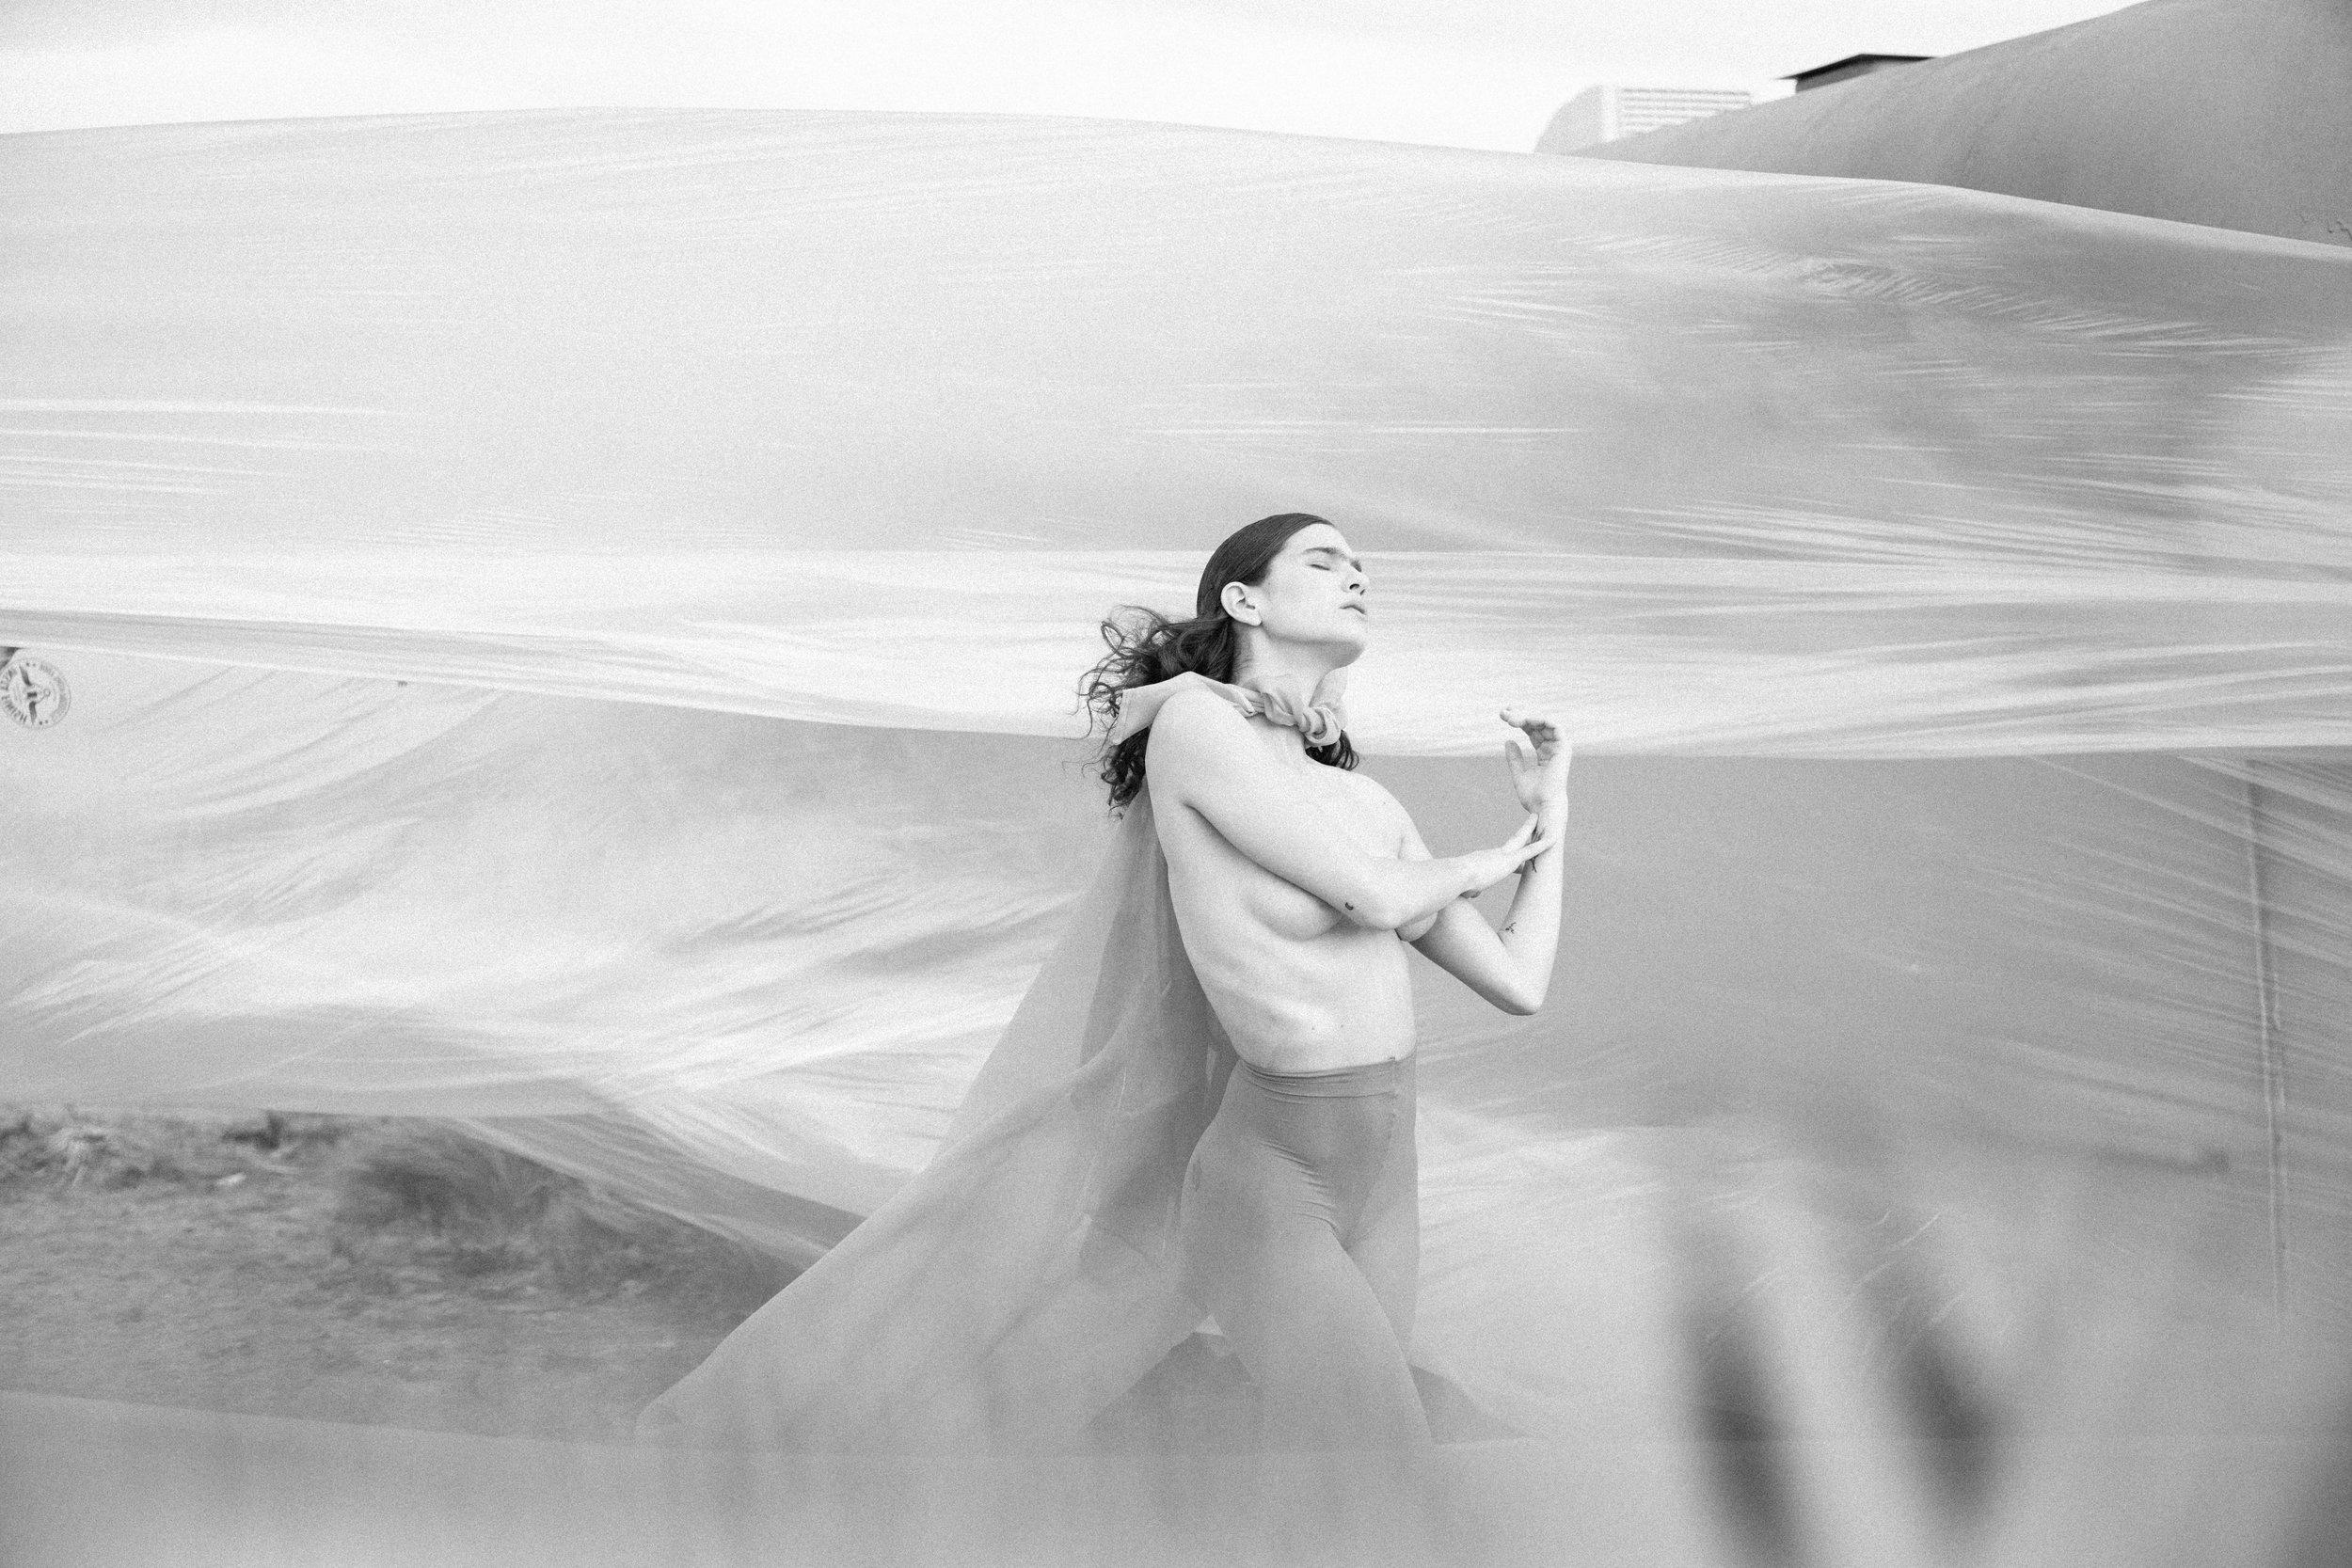 yeah field trip-marfa texas-el cosmico-bare essentials-workshop-nude-portrait-photographer-seattle photographer janelle elaine-32.jpg